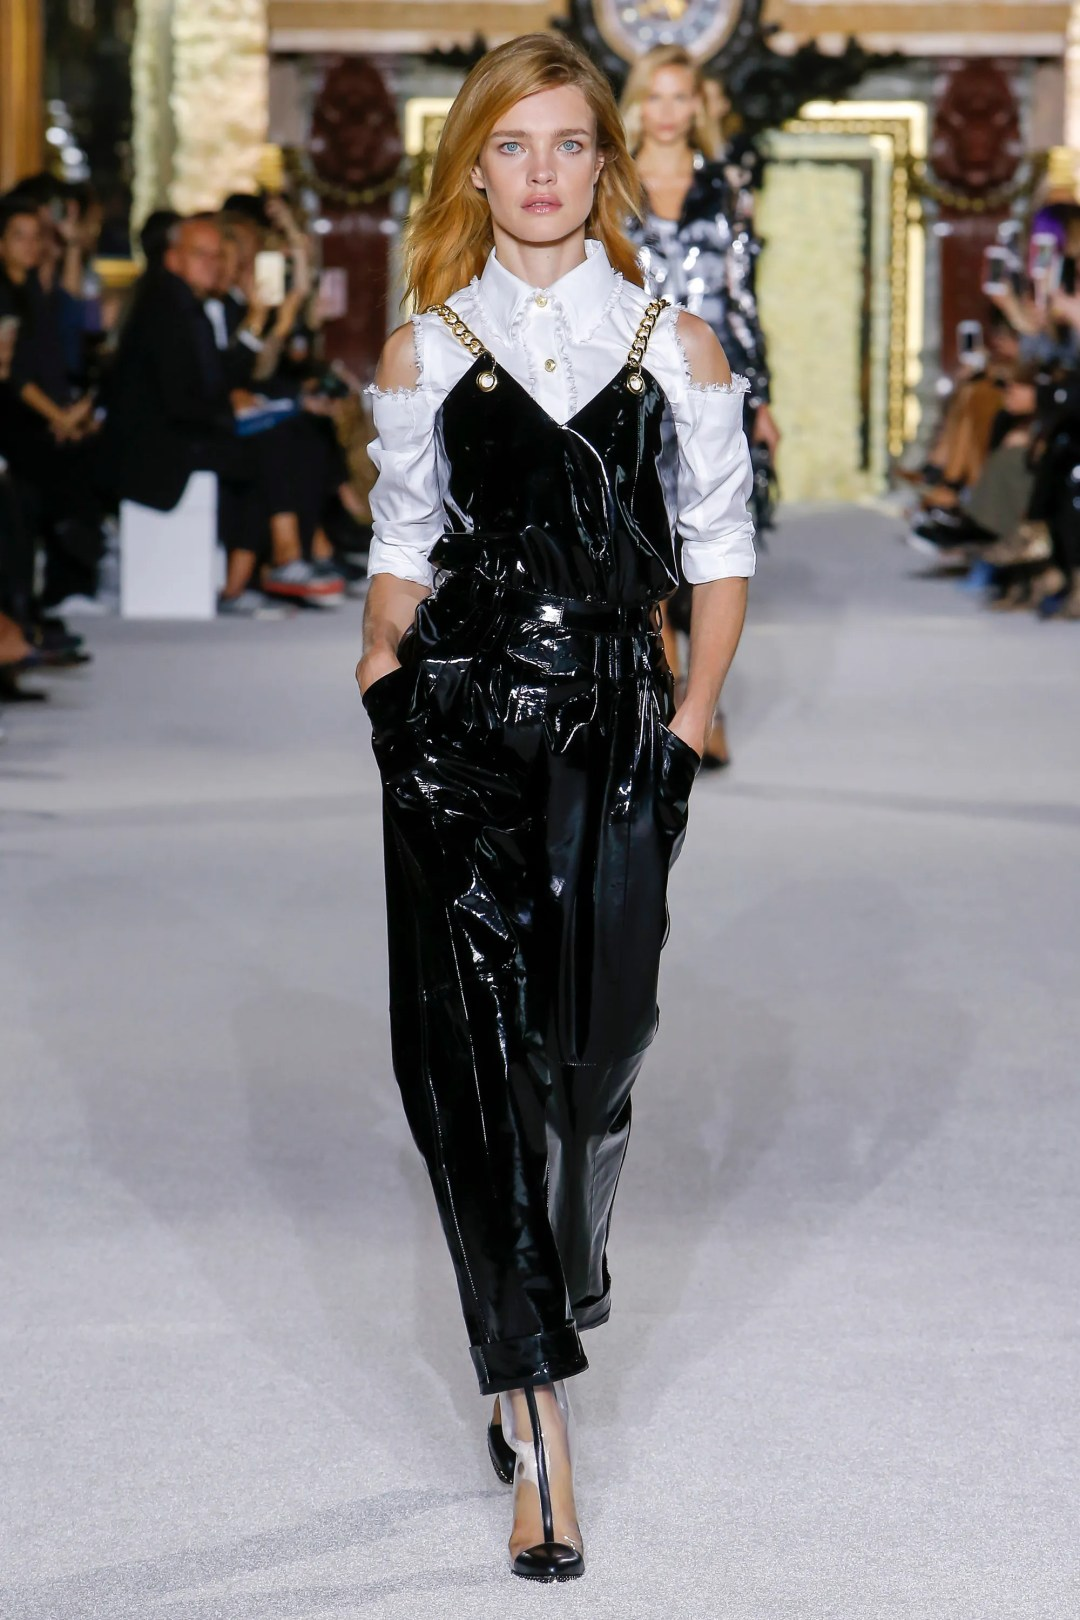 FULL COLLECTION: BALMAIN SPRING 2018 READY-TO-WEAR Haute Couture   #Runway #Fashion #Style #Couture #FashionWeek #RenttheR unway #ad #RTW @Balmain   via @FashionWeekPro ? FashionWeek.pro